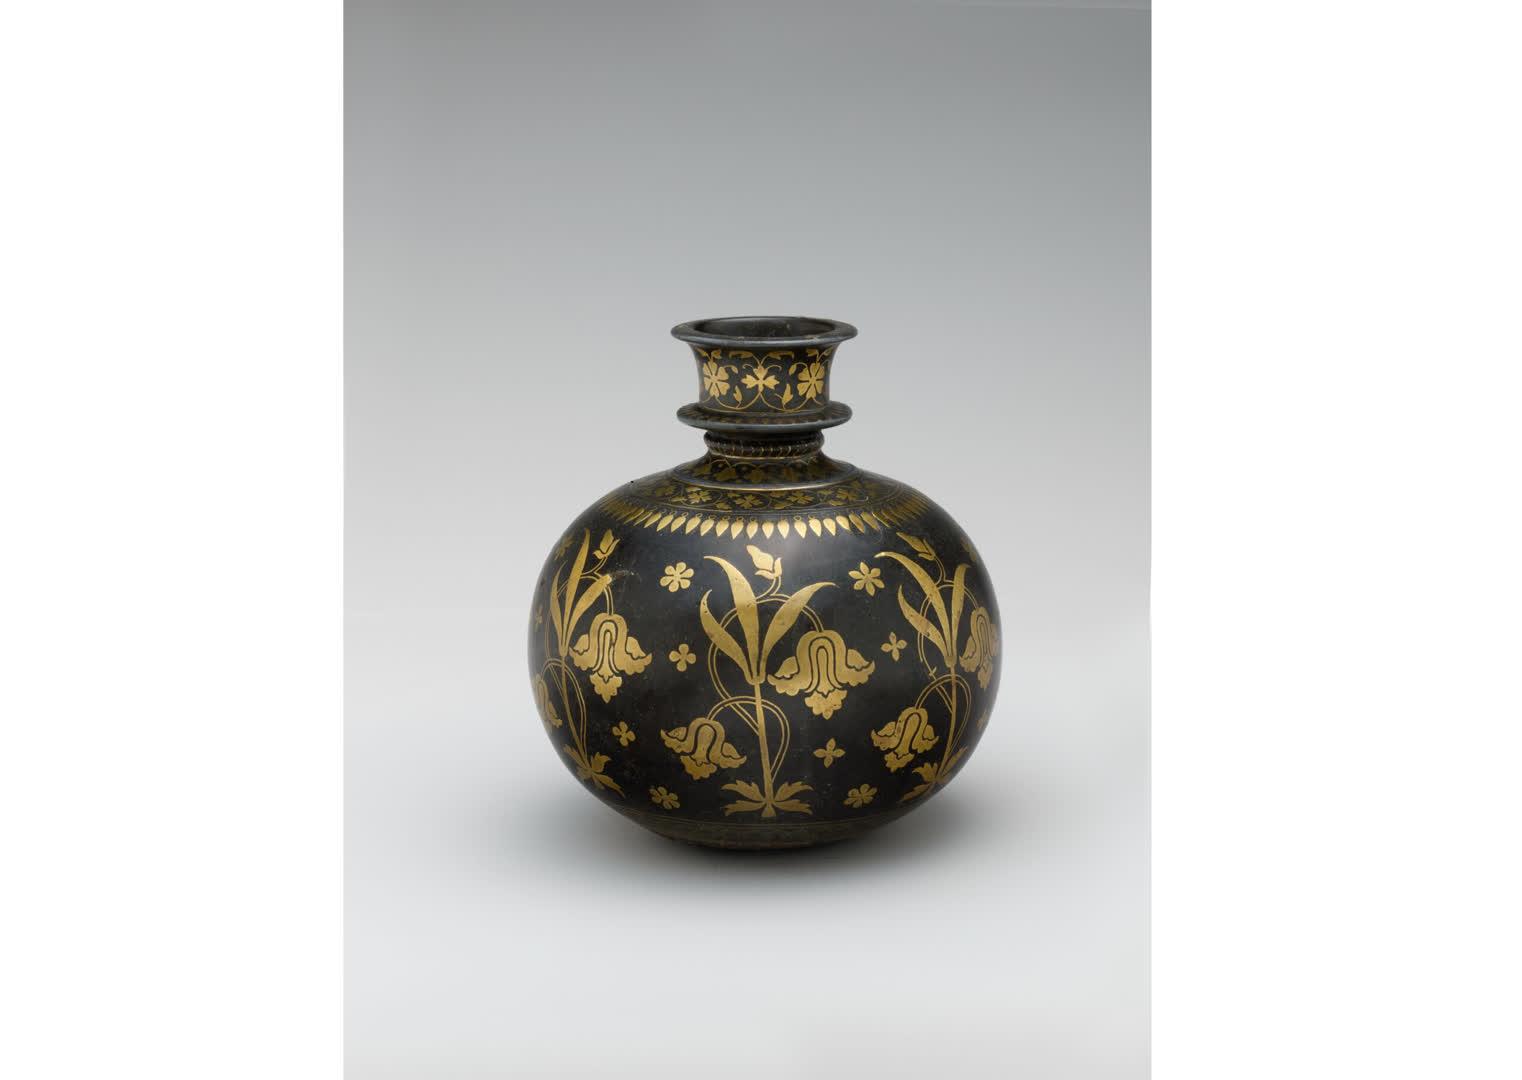 Hukka base with Bidri work, 17th century | The Metropolitan Museum of Art